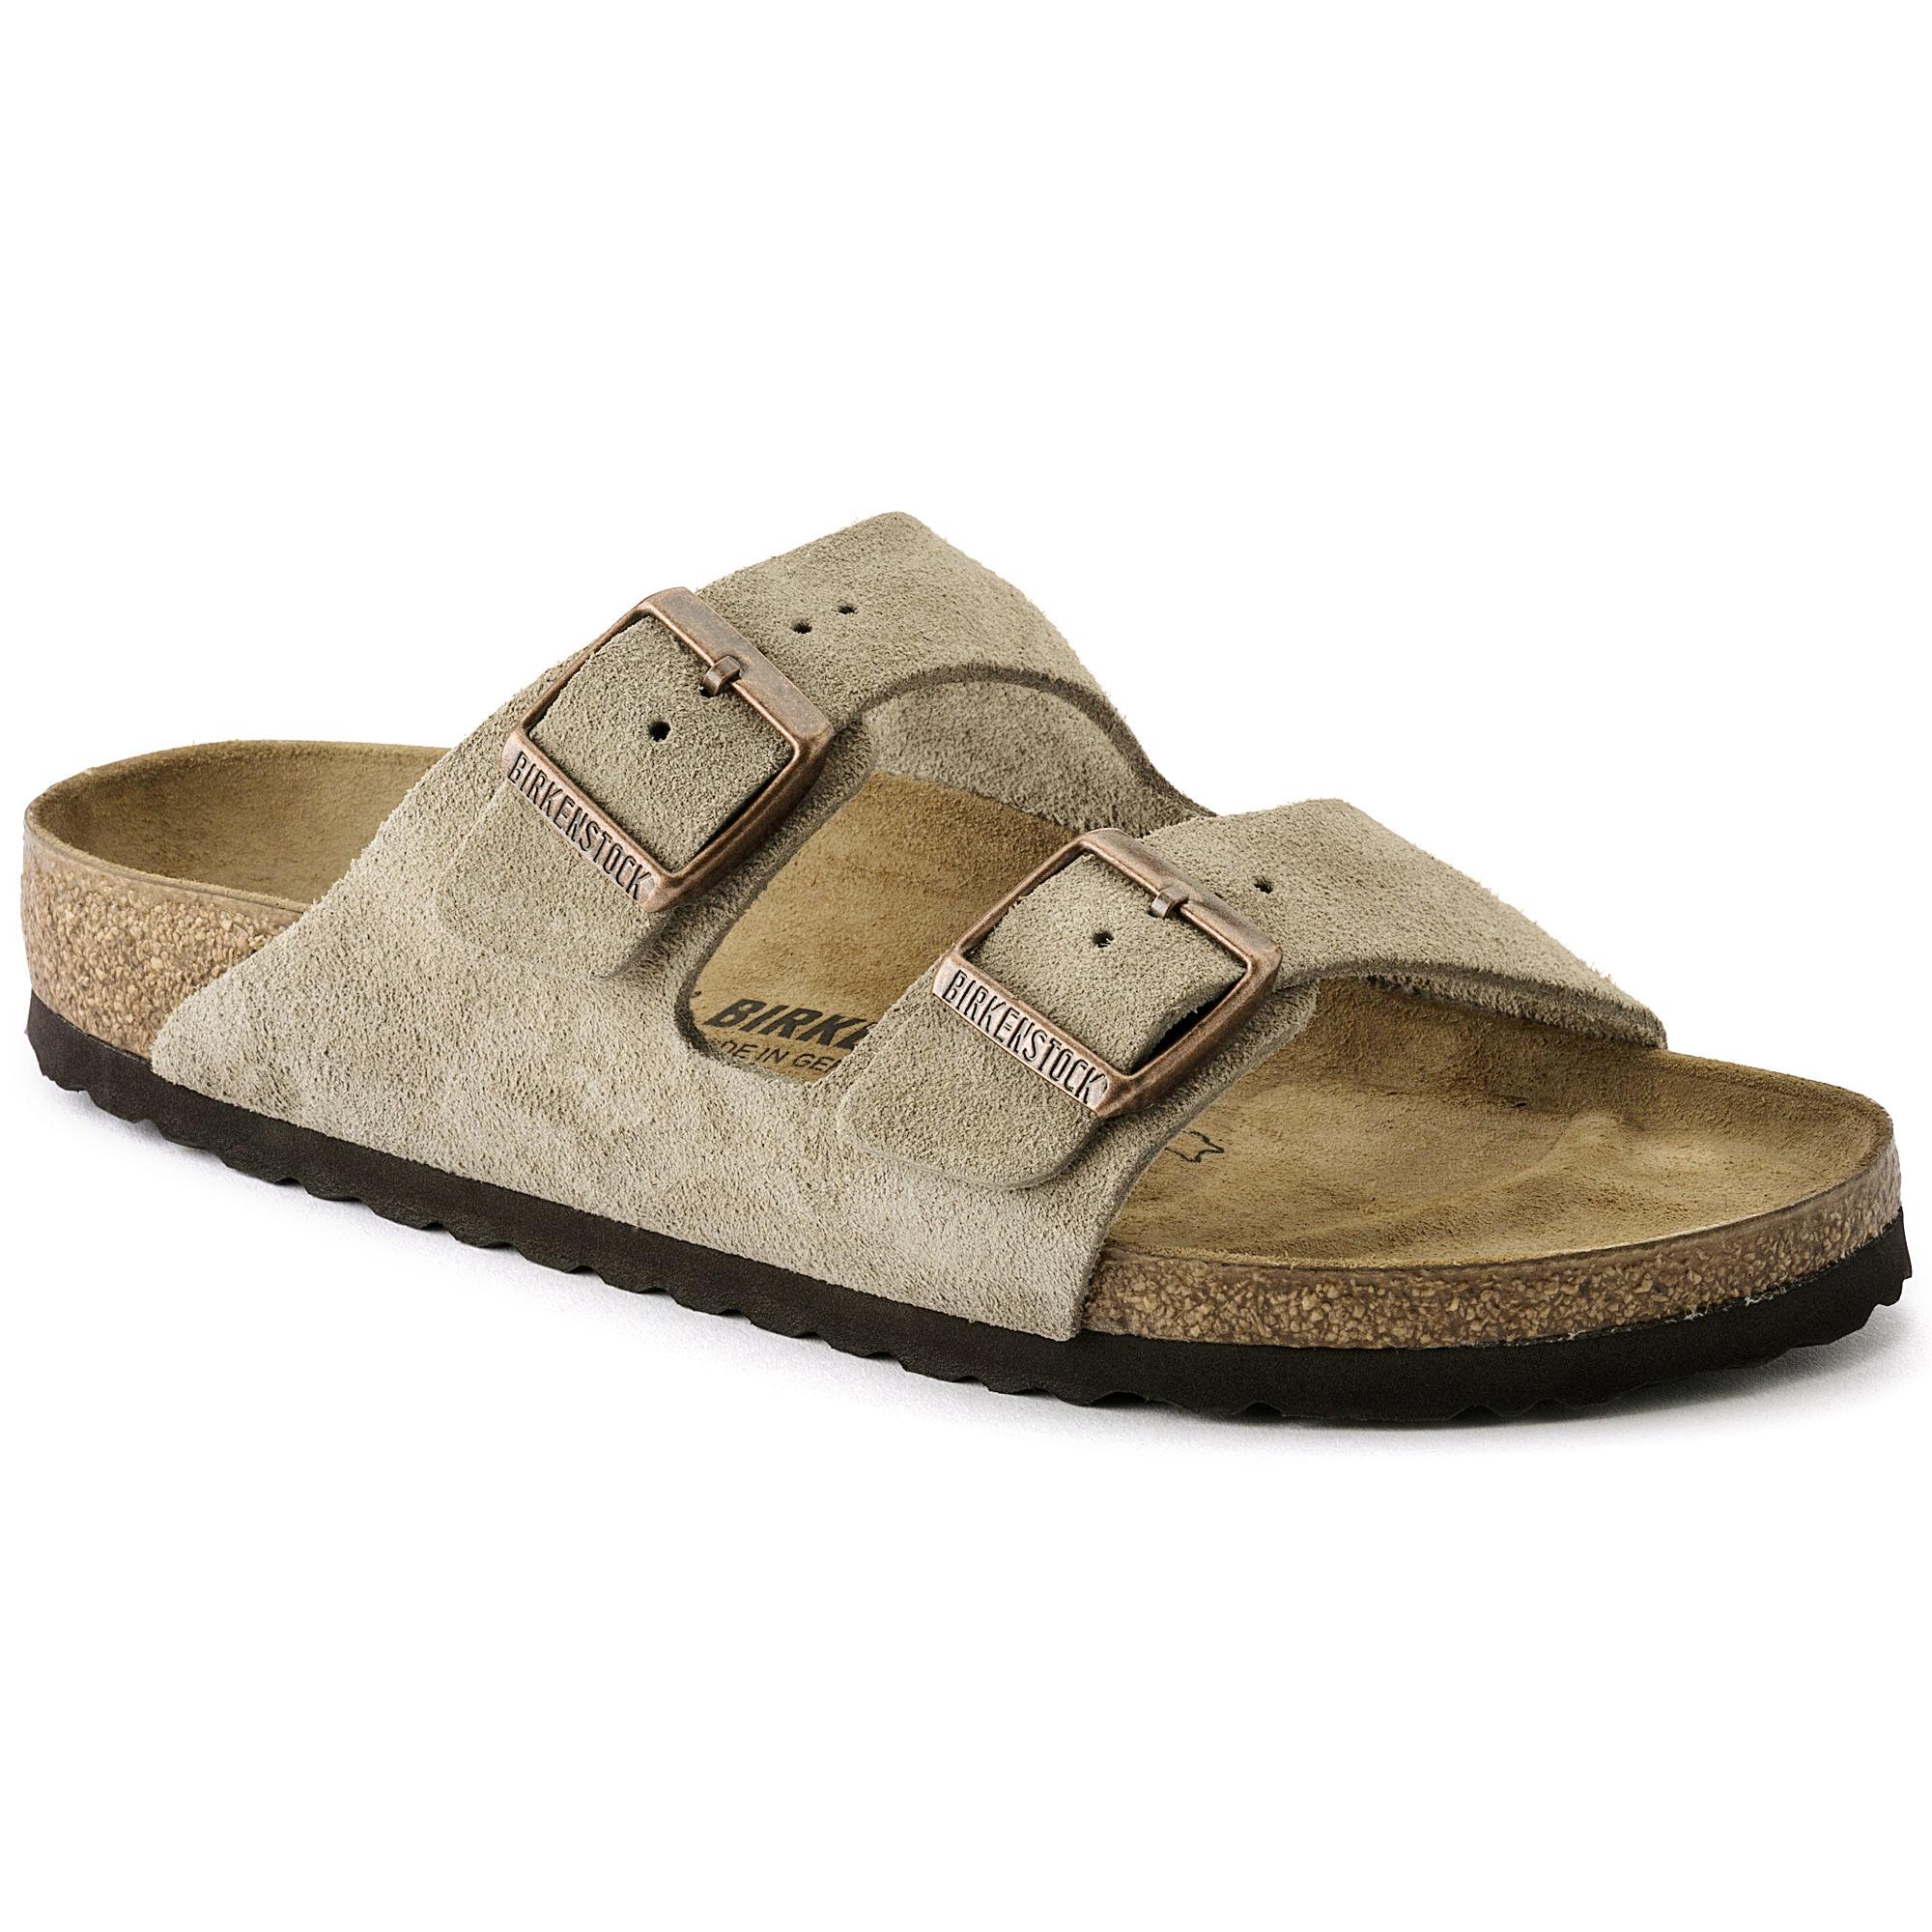 suede arizona birkenstocks on sale